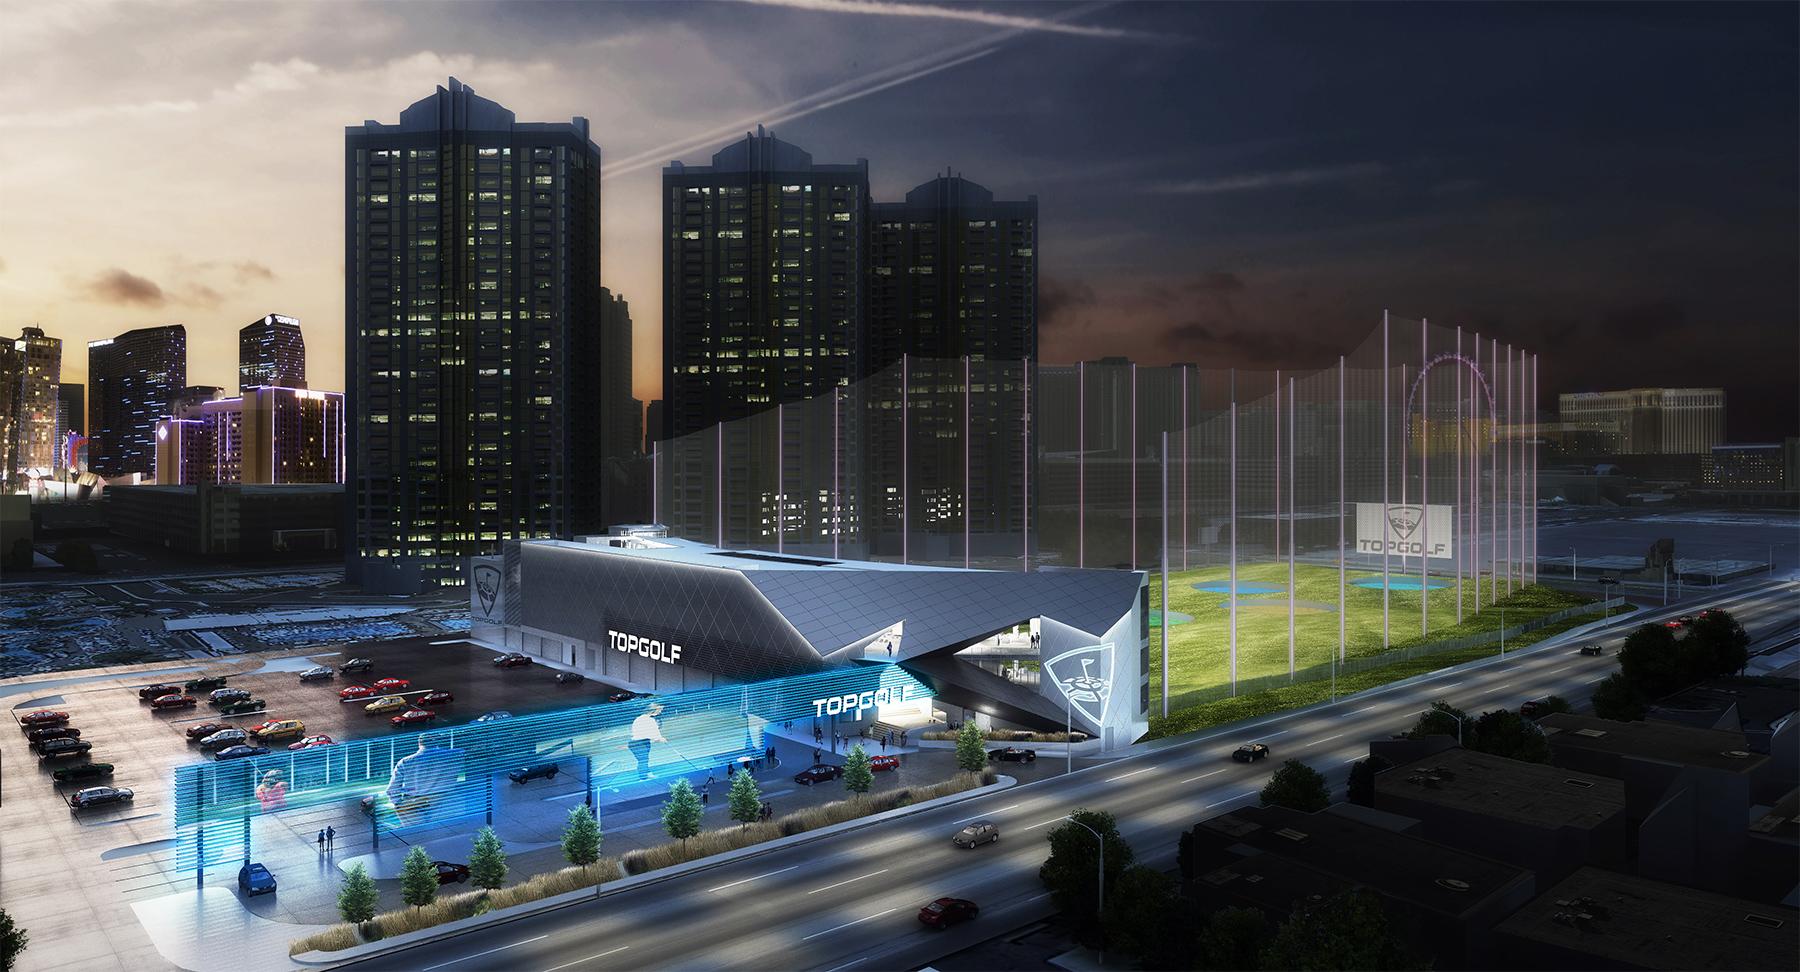 Topgolf Announces Flagship Las Vegas Location at MGM Grand